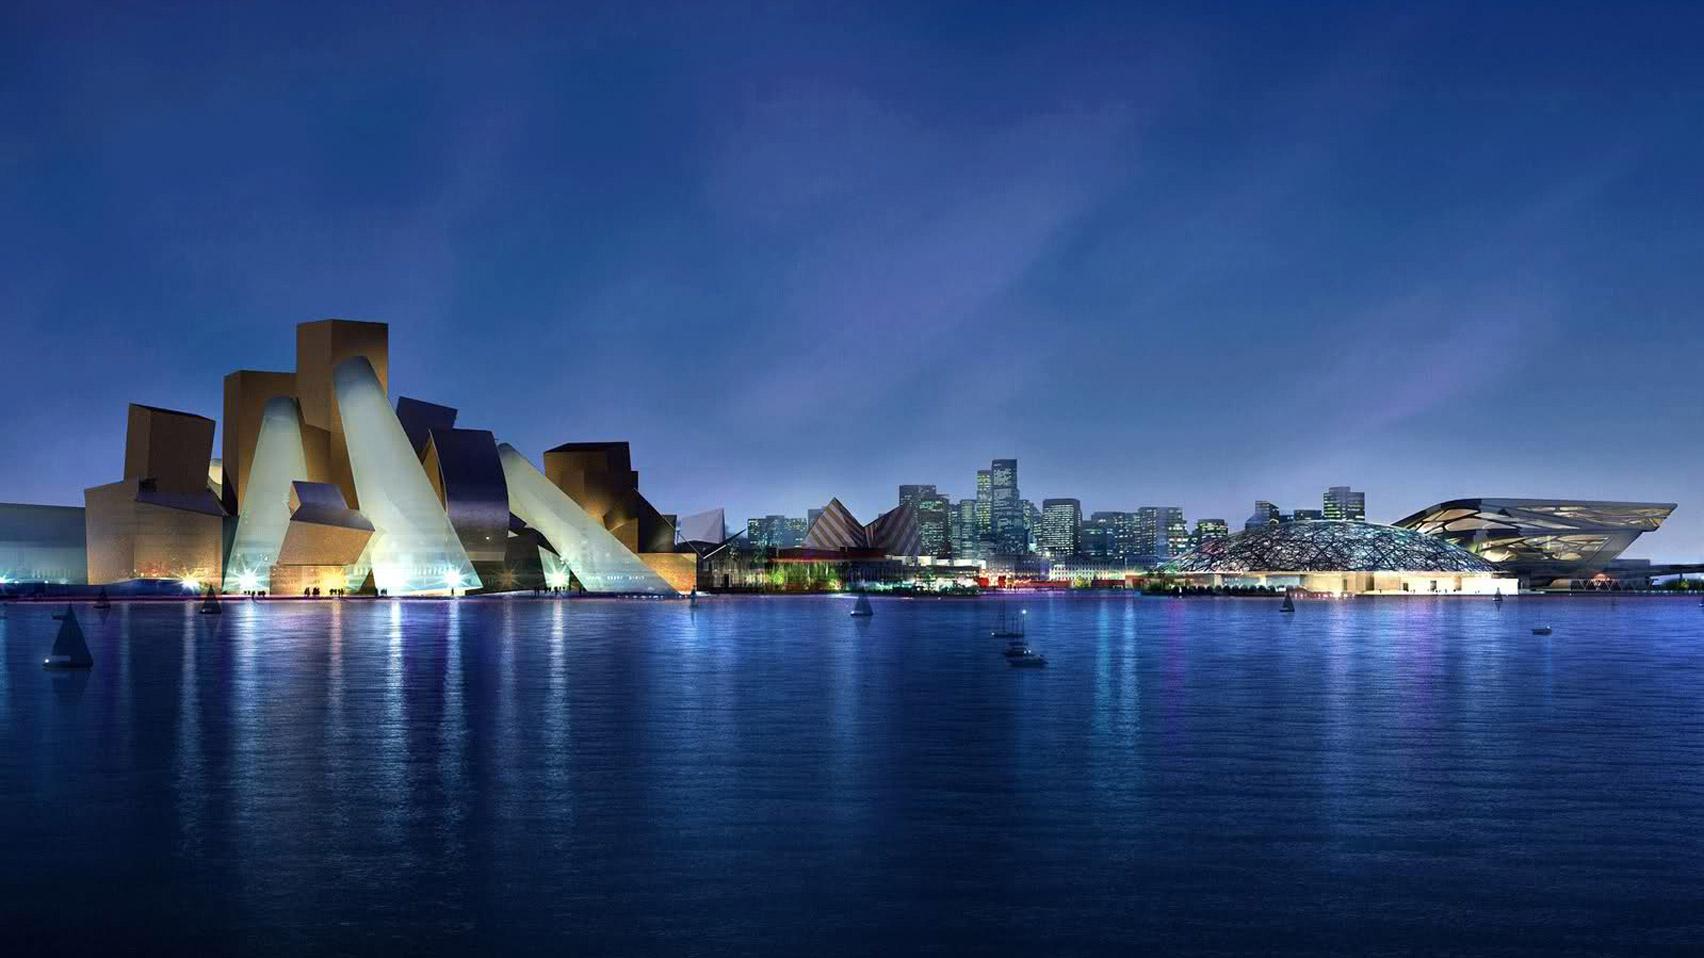 Guggenheim Abu Dhabi on Saadiyat Island